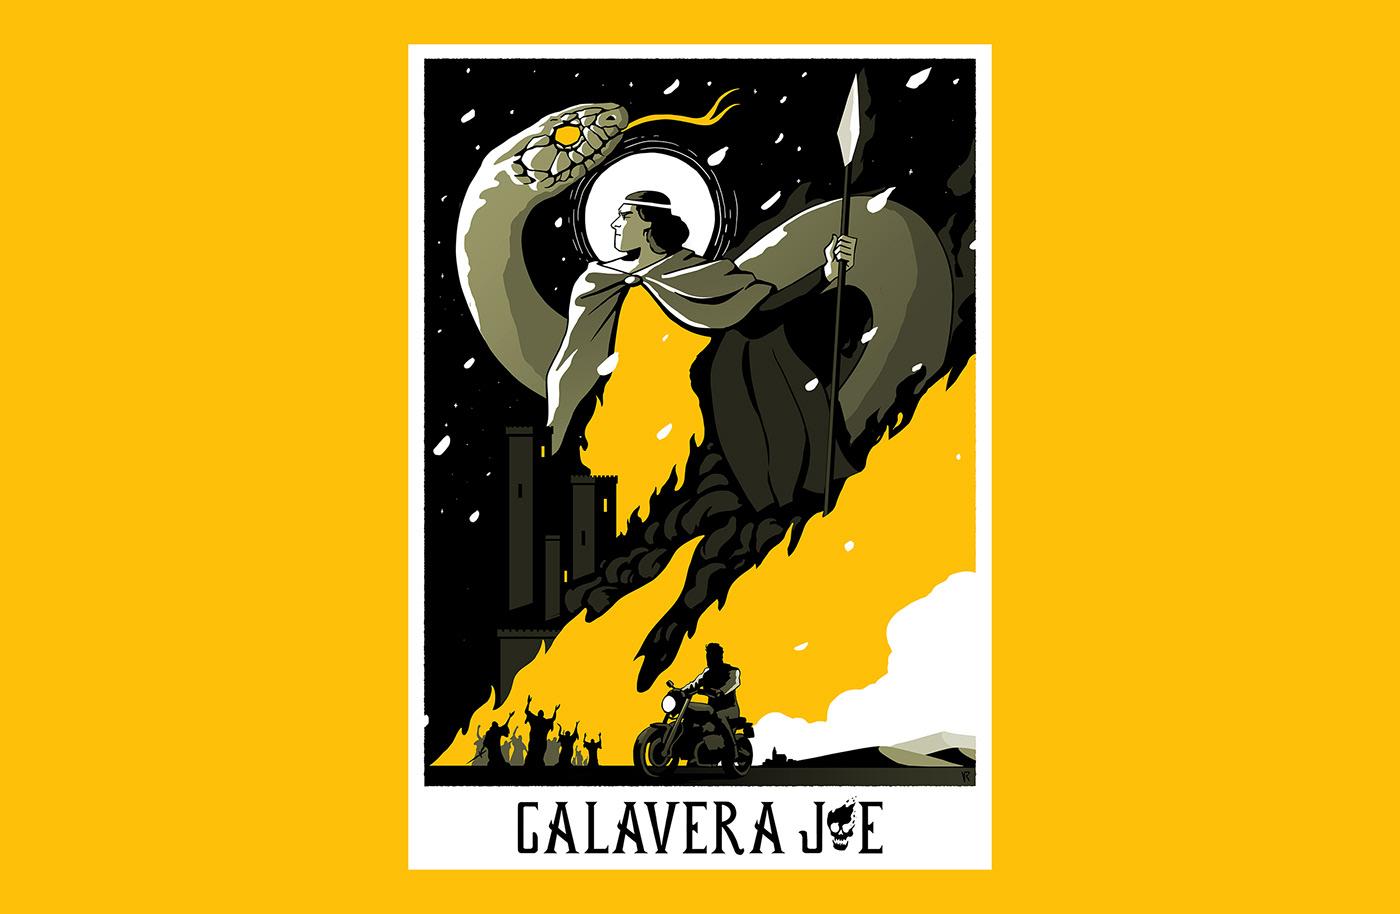 biker poster affiche knight fire posterdesign snake Castle black magic fantasy